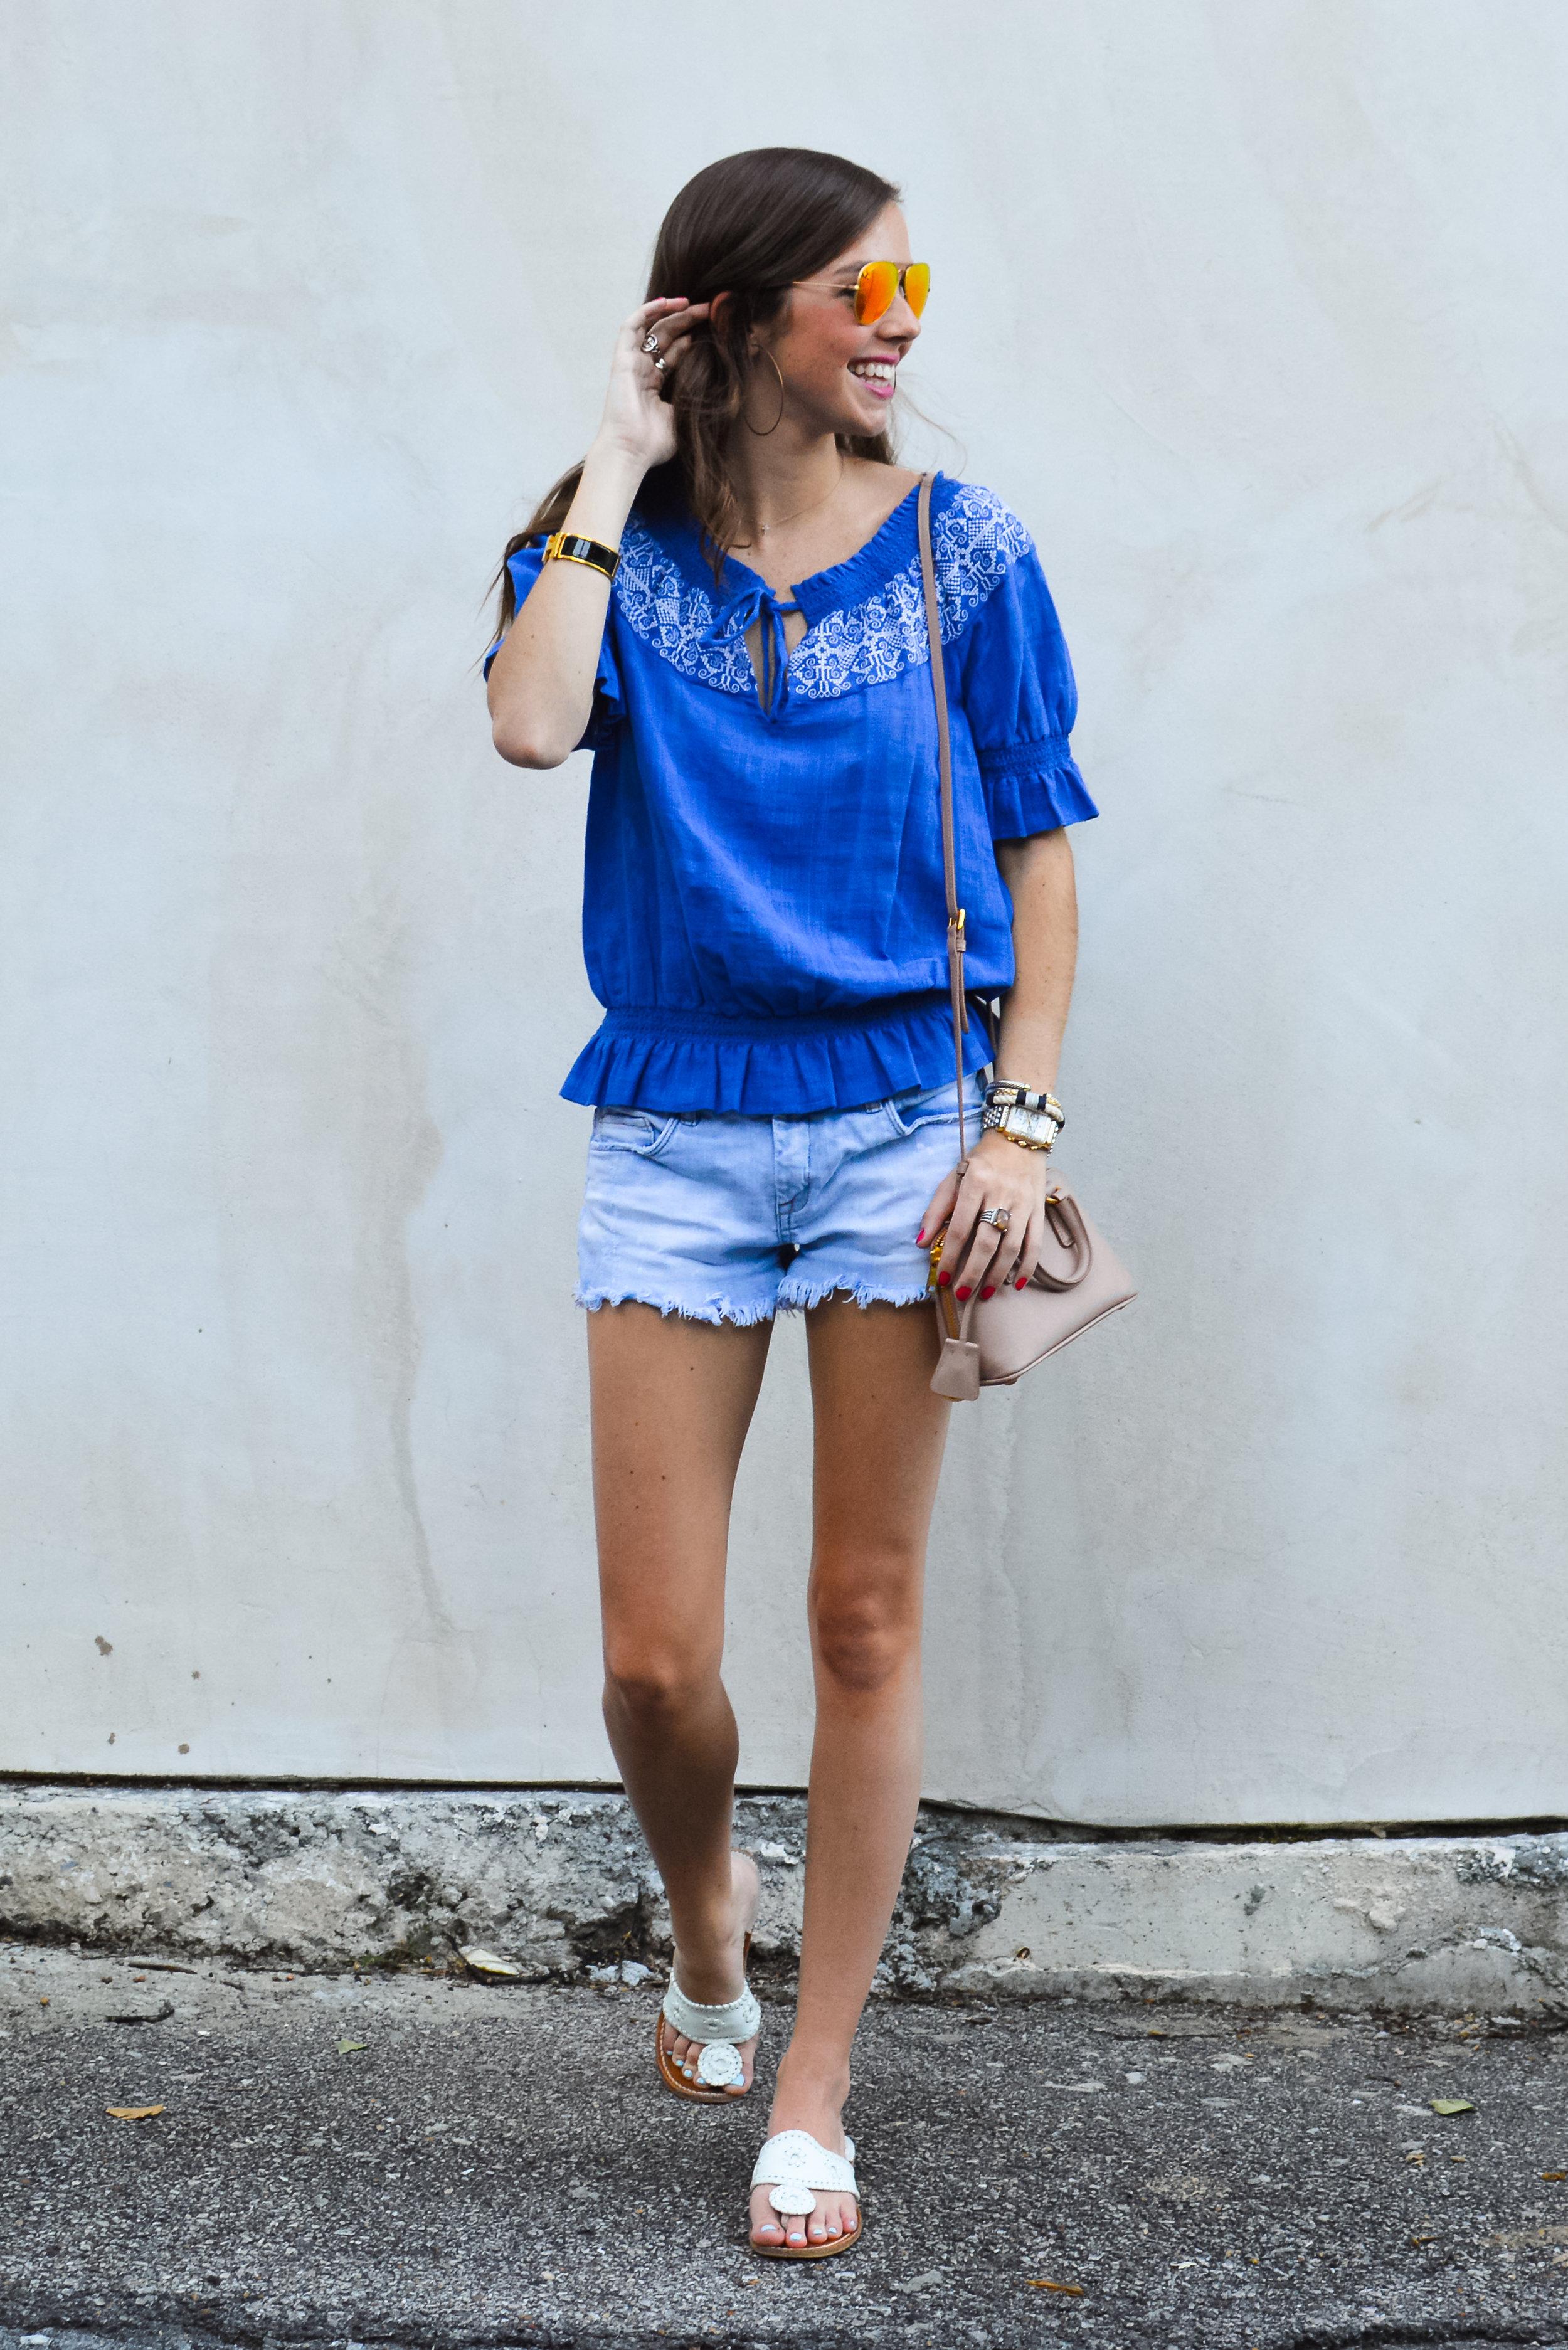 lcb_style_fashion_blogger_fourth of july (1 of 4).jpg